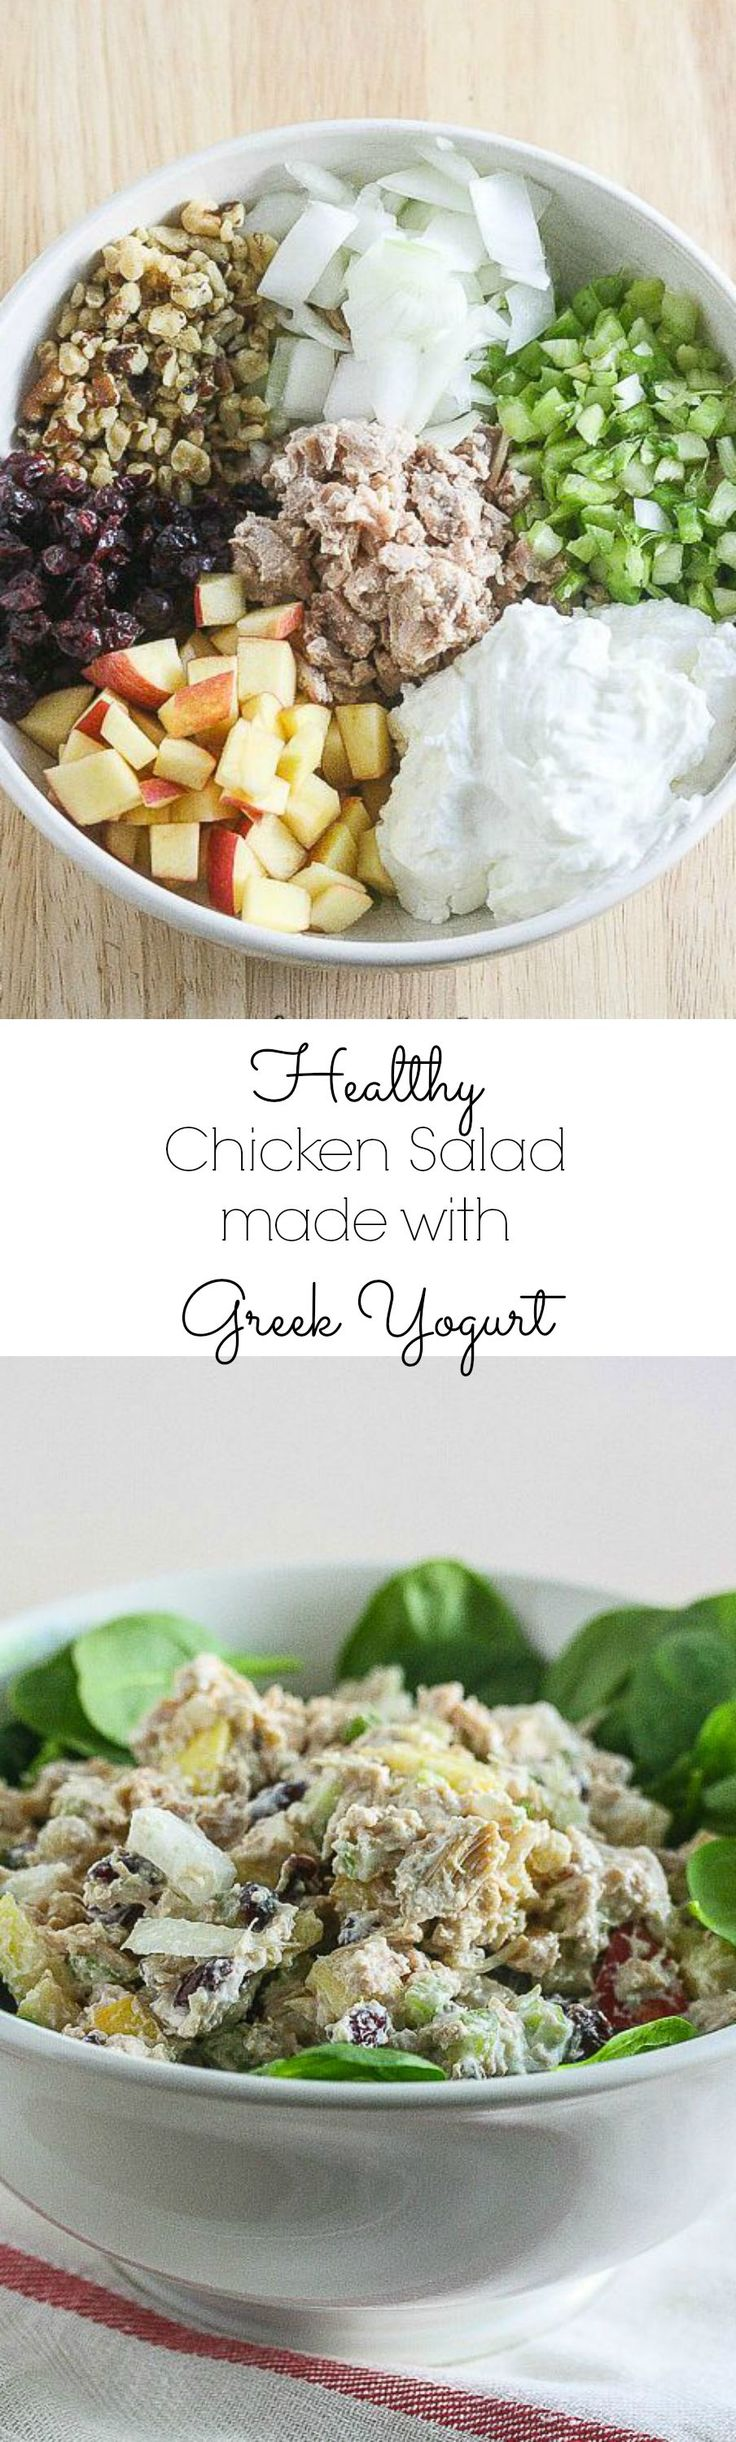 Healthy Chicken Salad made with Greek Yogurt @PacificFoods #NourishEveryBody (Chicken Healthy)